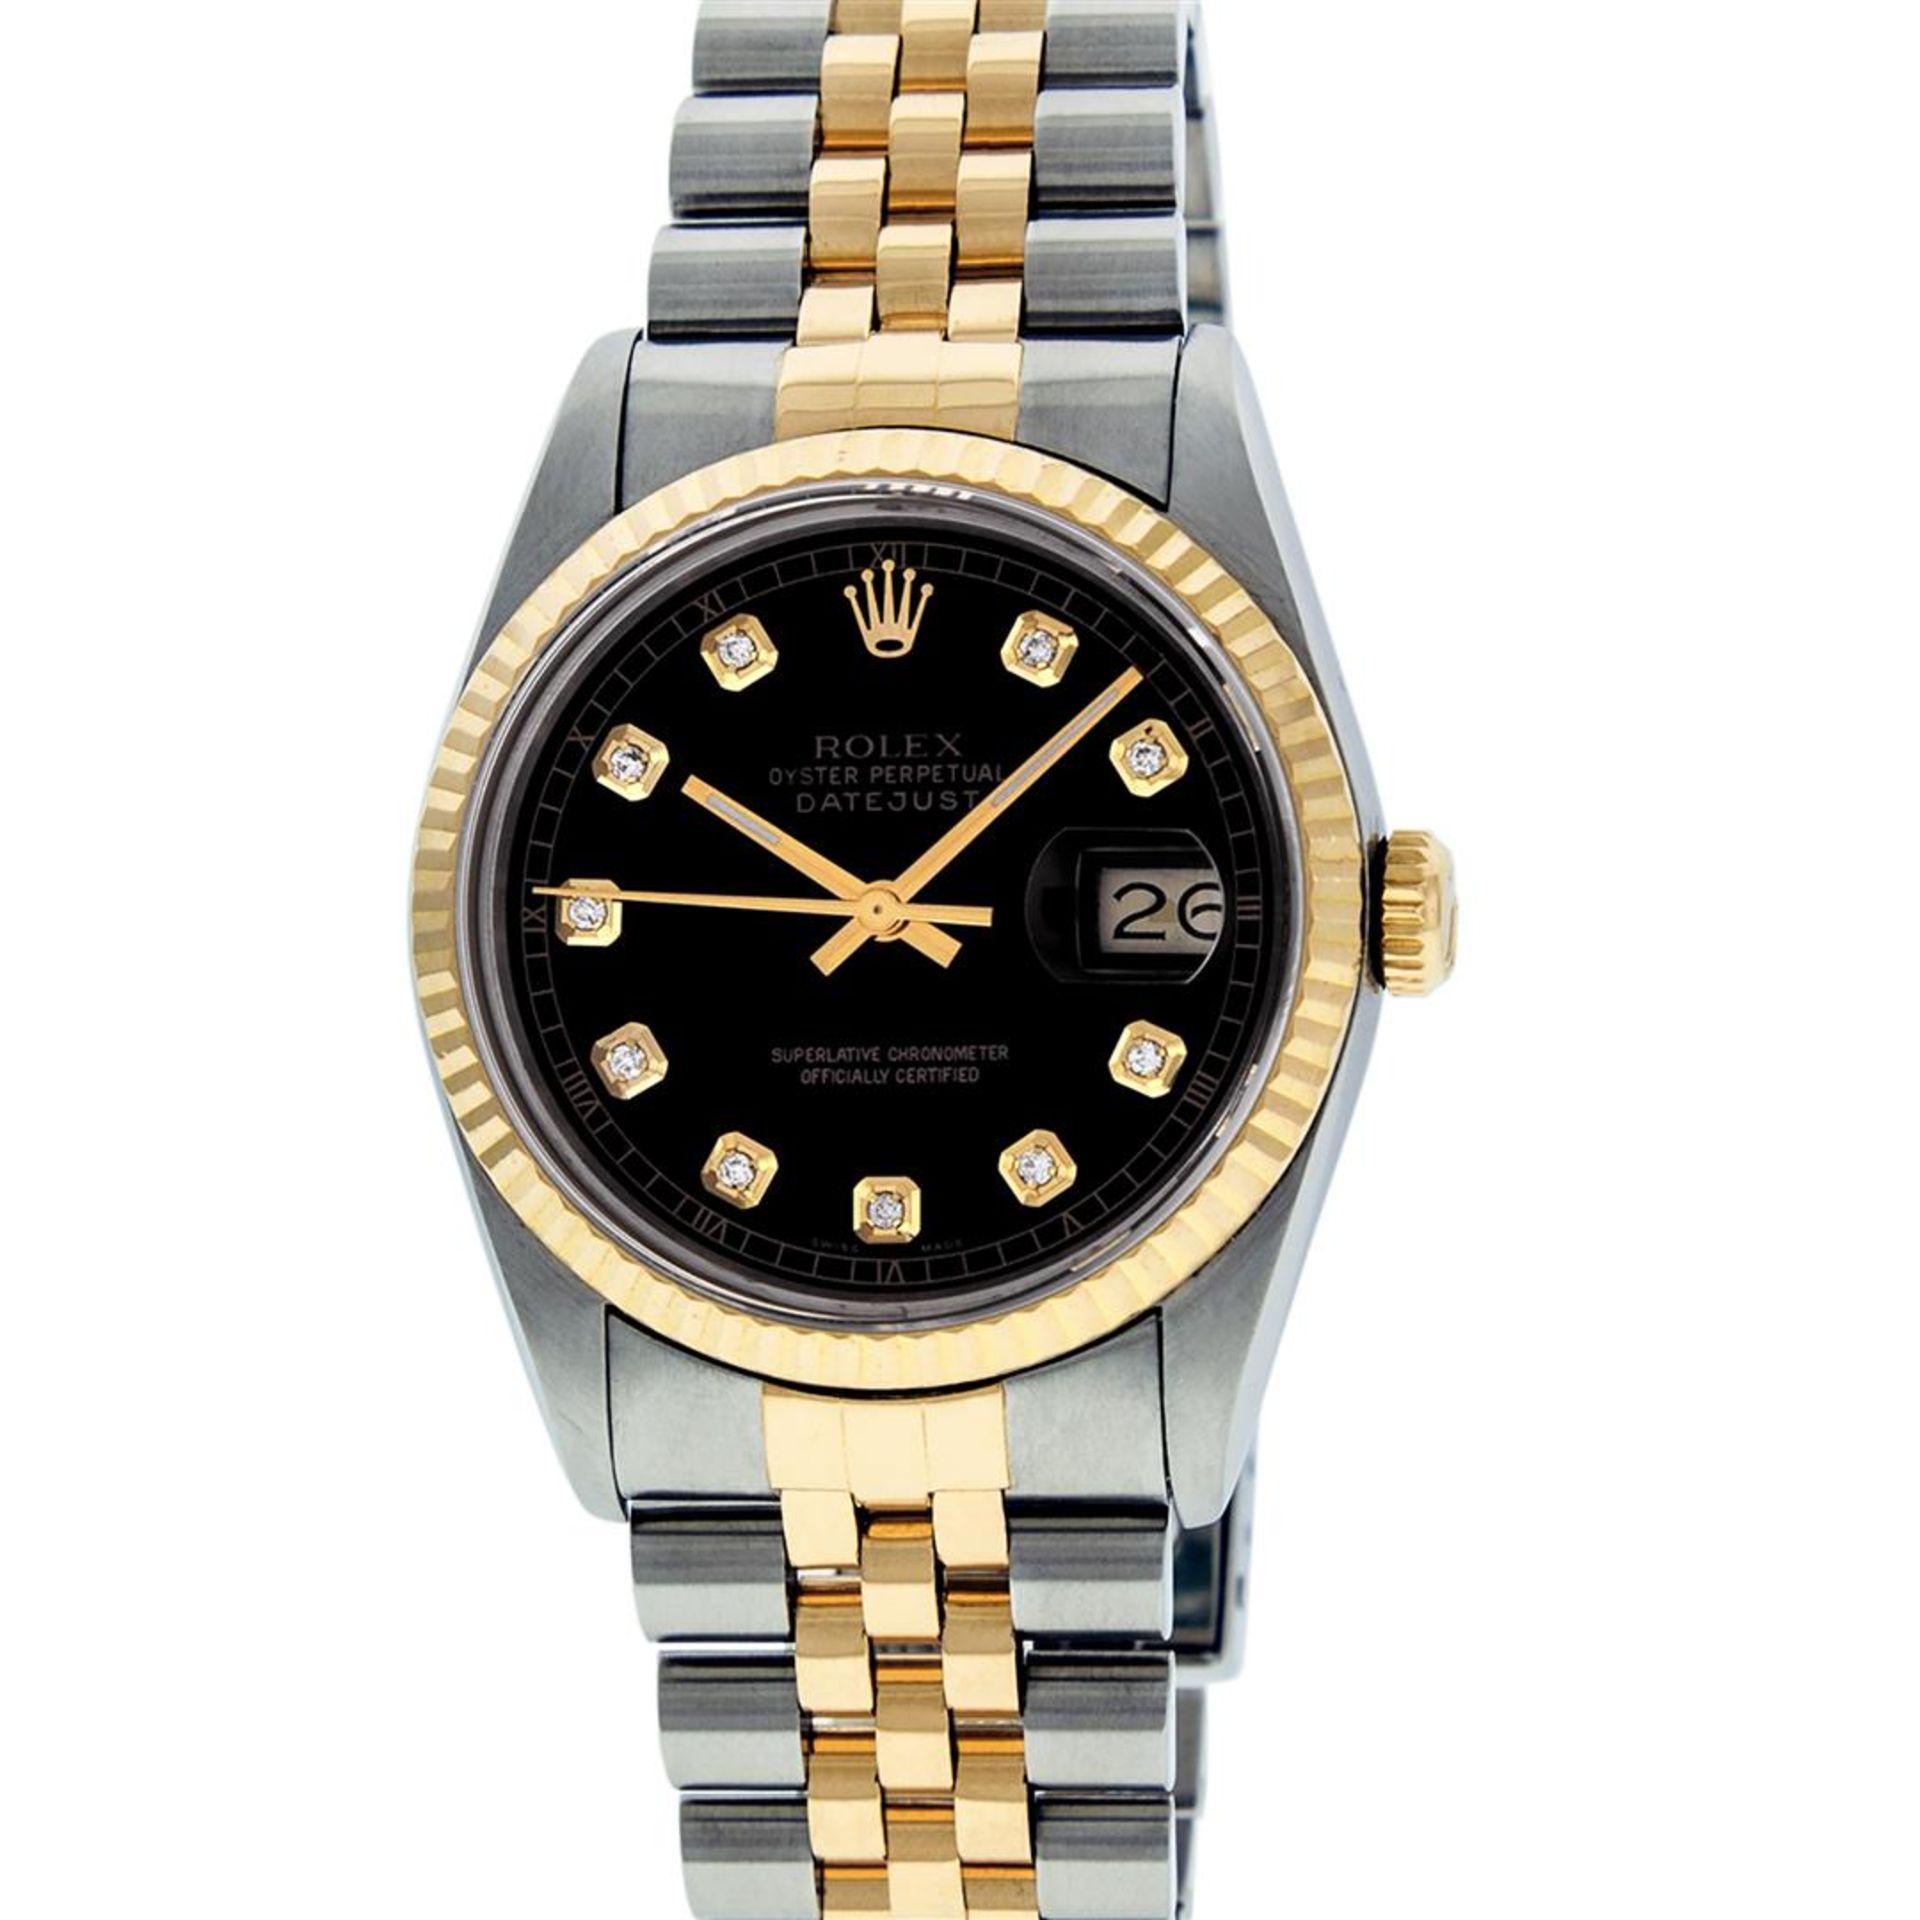 Rolex Mens 2 Tone Black Diamond 36MM Datejust Wristwatch - Image 2 of 9